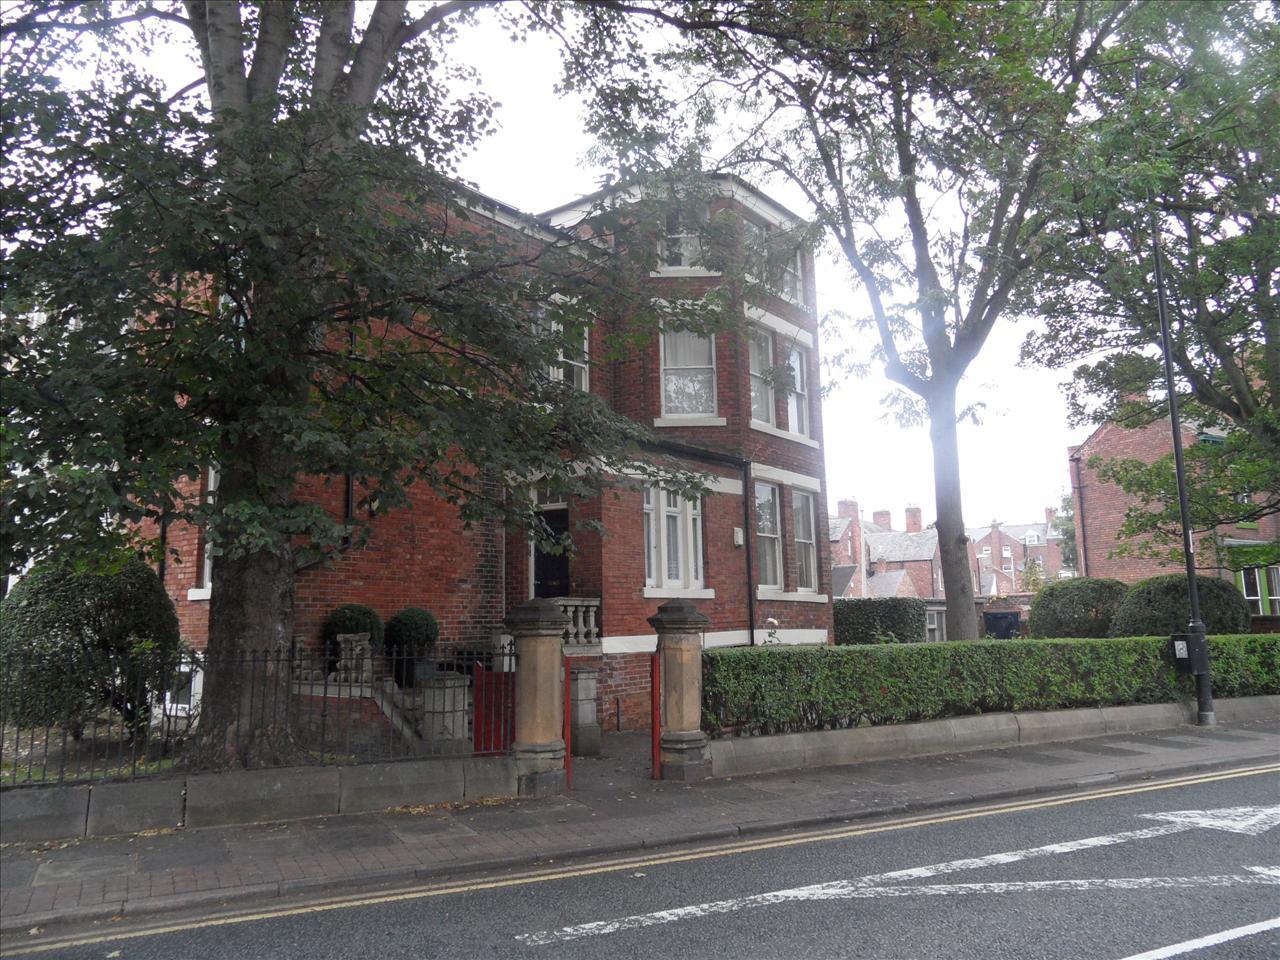 1 Bedroom Flat To Rent Mowbray Road Sunderland Sr Sr2 8hu